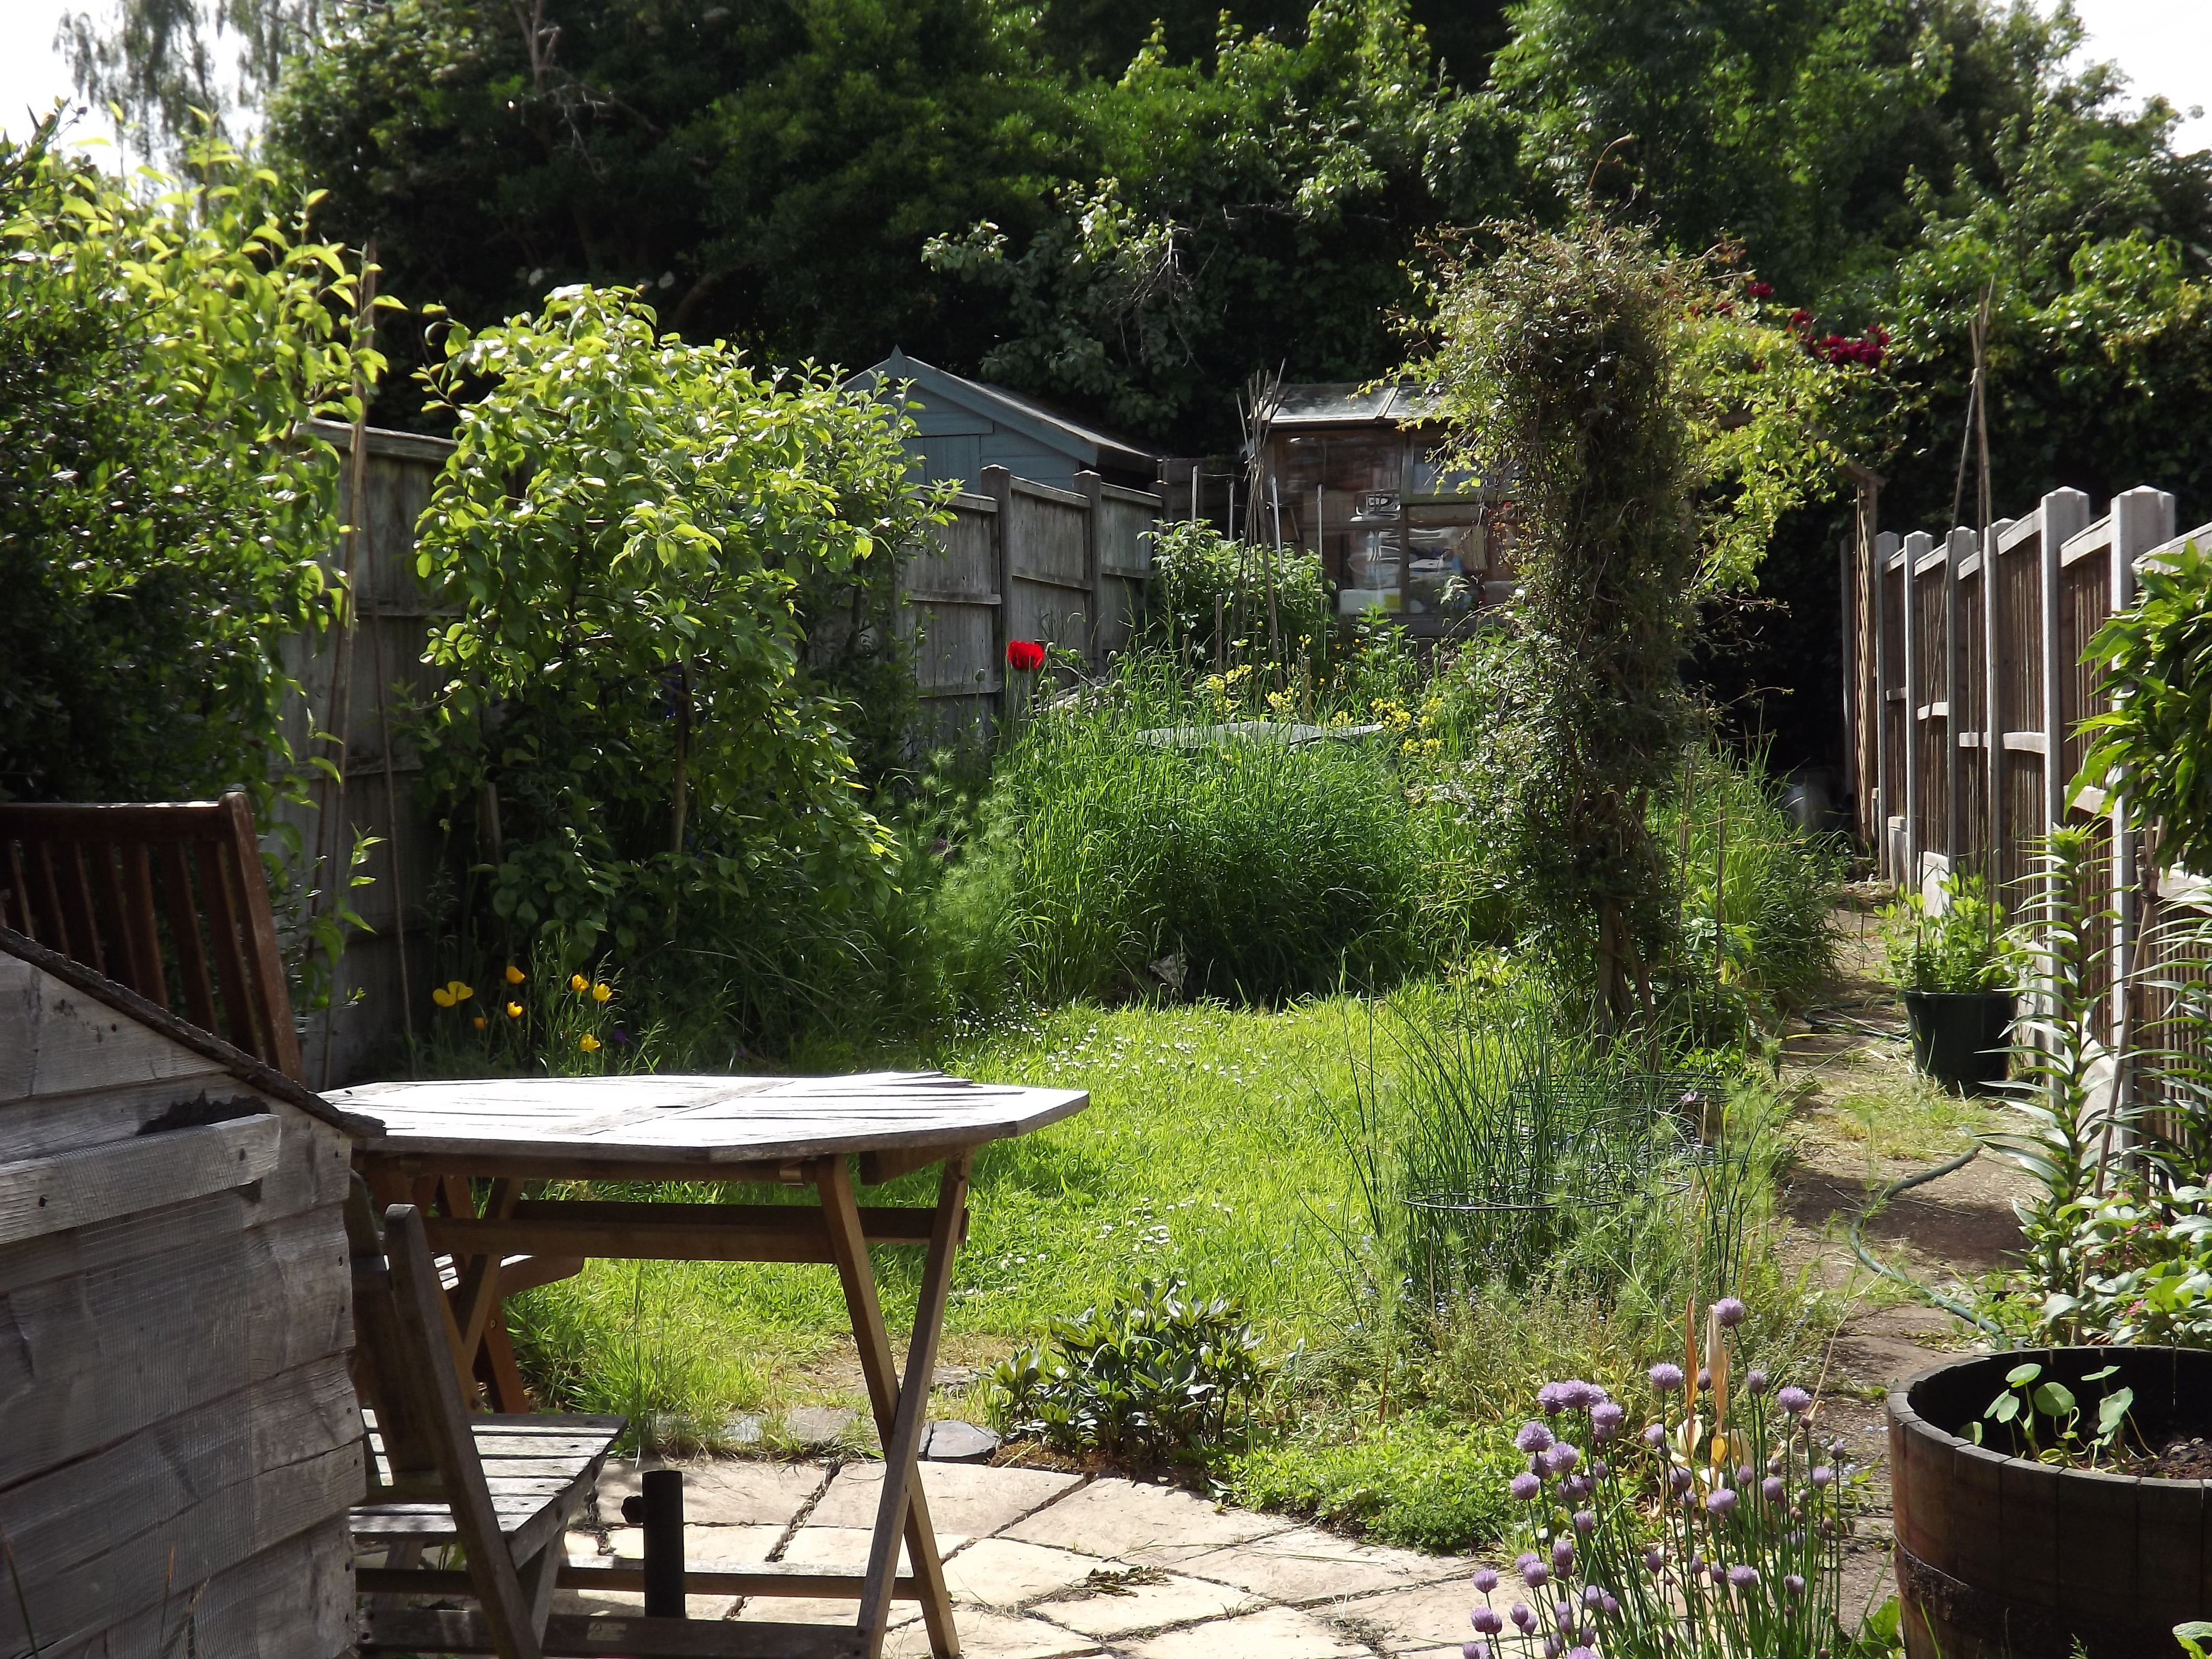 garden view with distant poppy